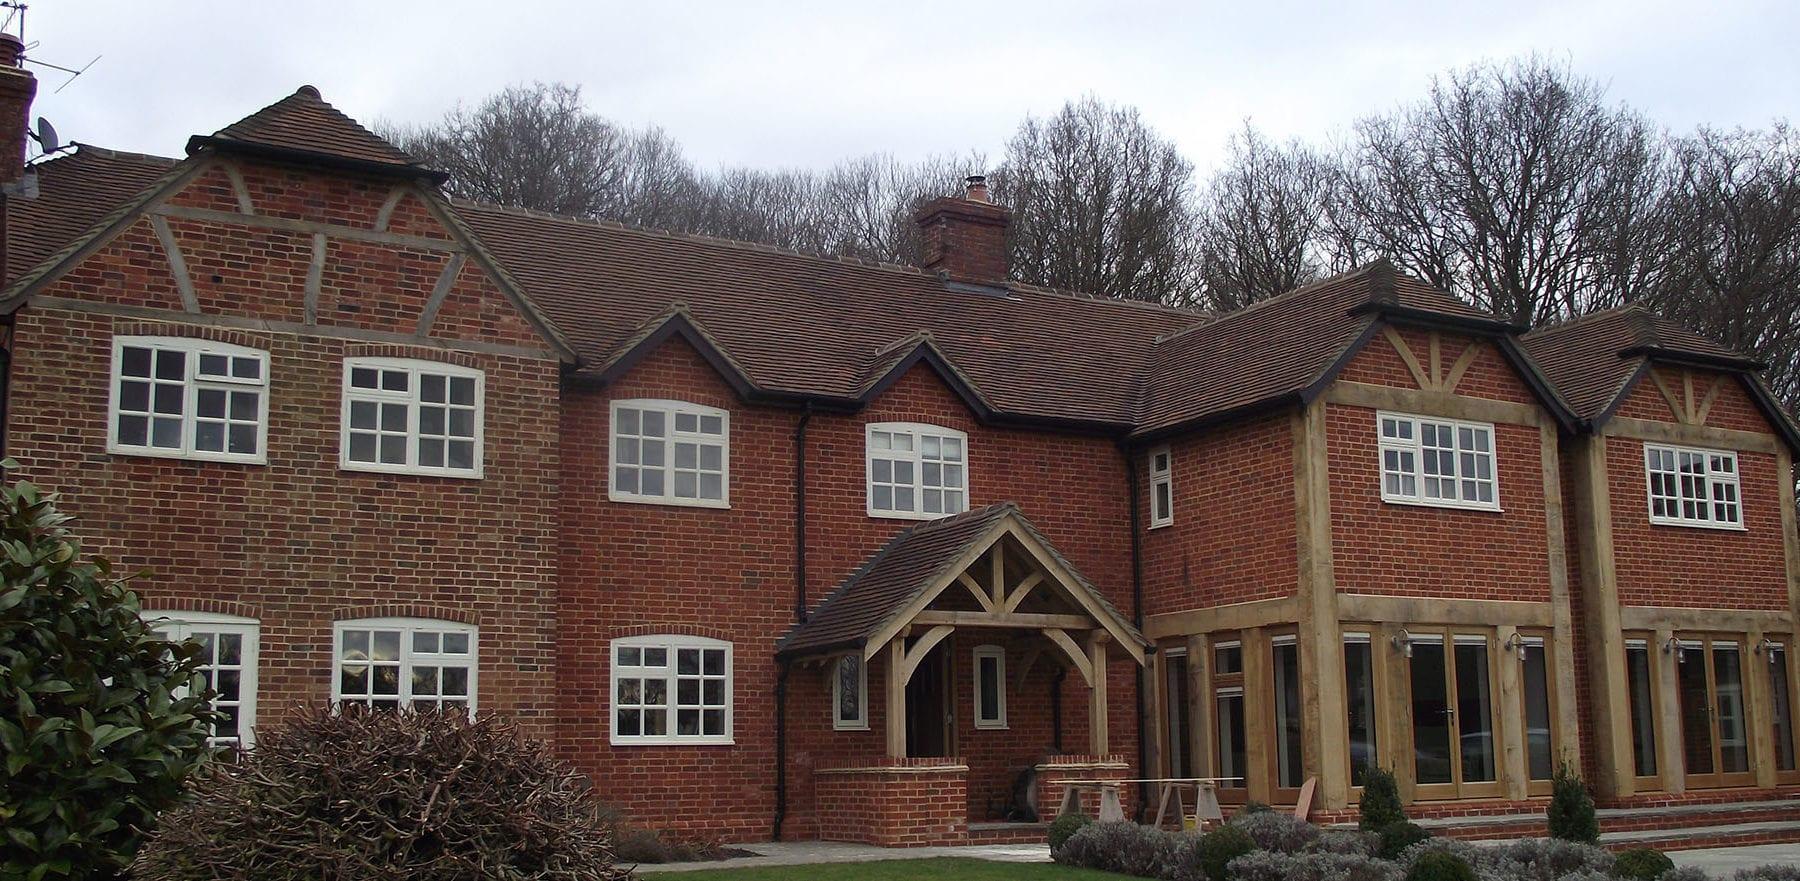 Lifestiles - Handmade Restoration Clay Roof Tiles - Roke, England 2